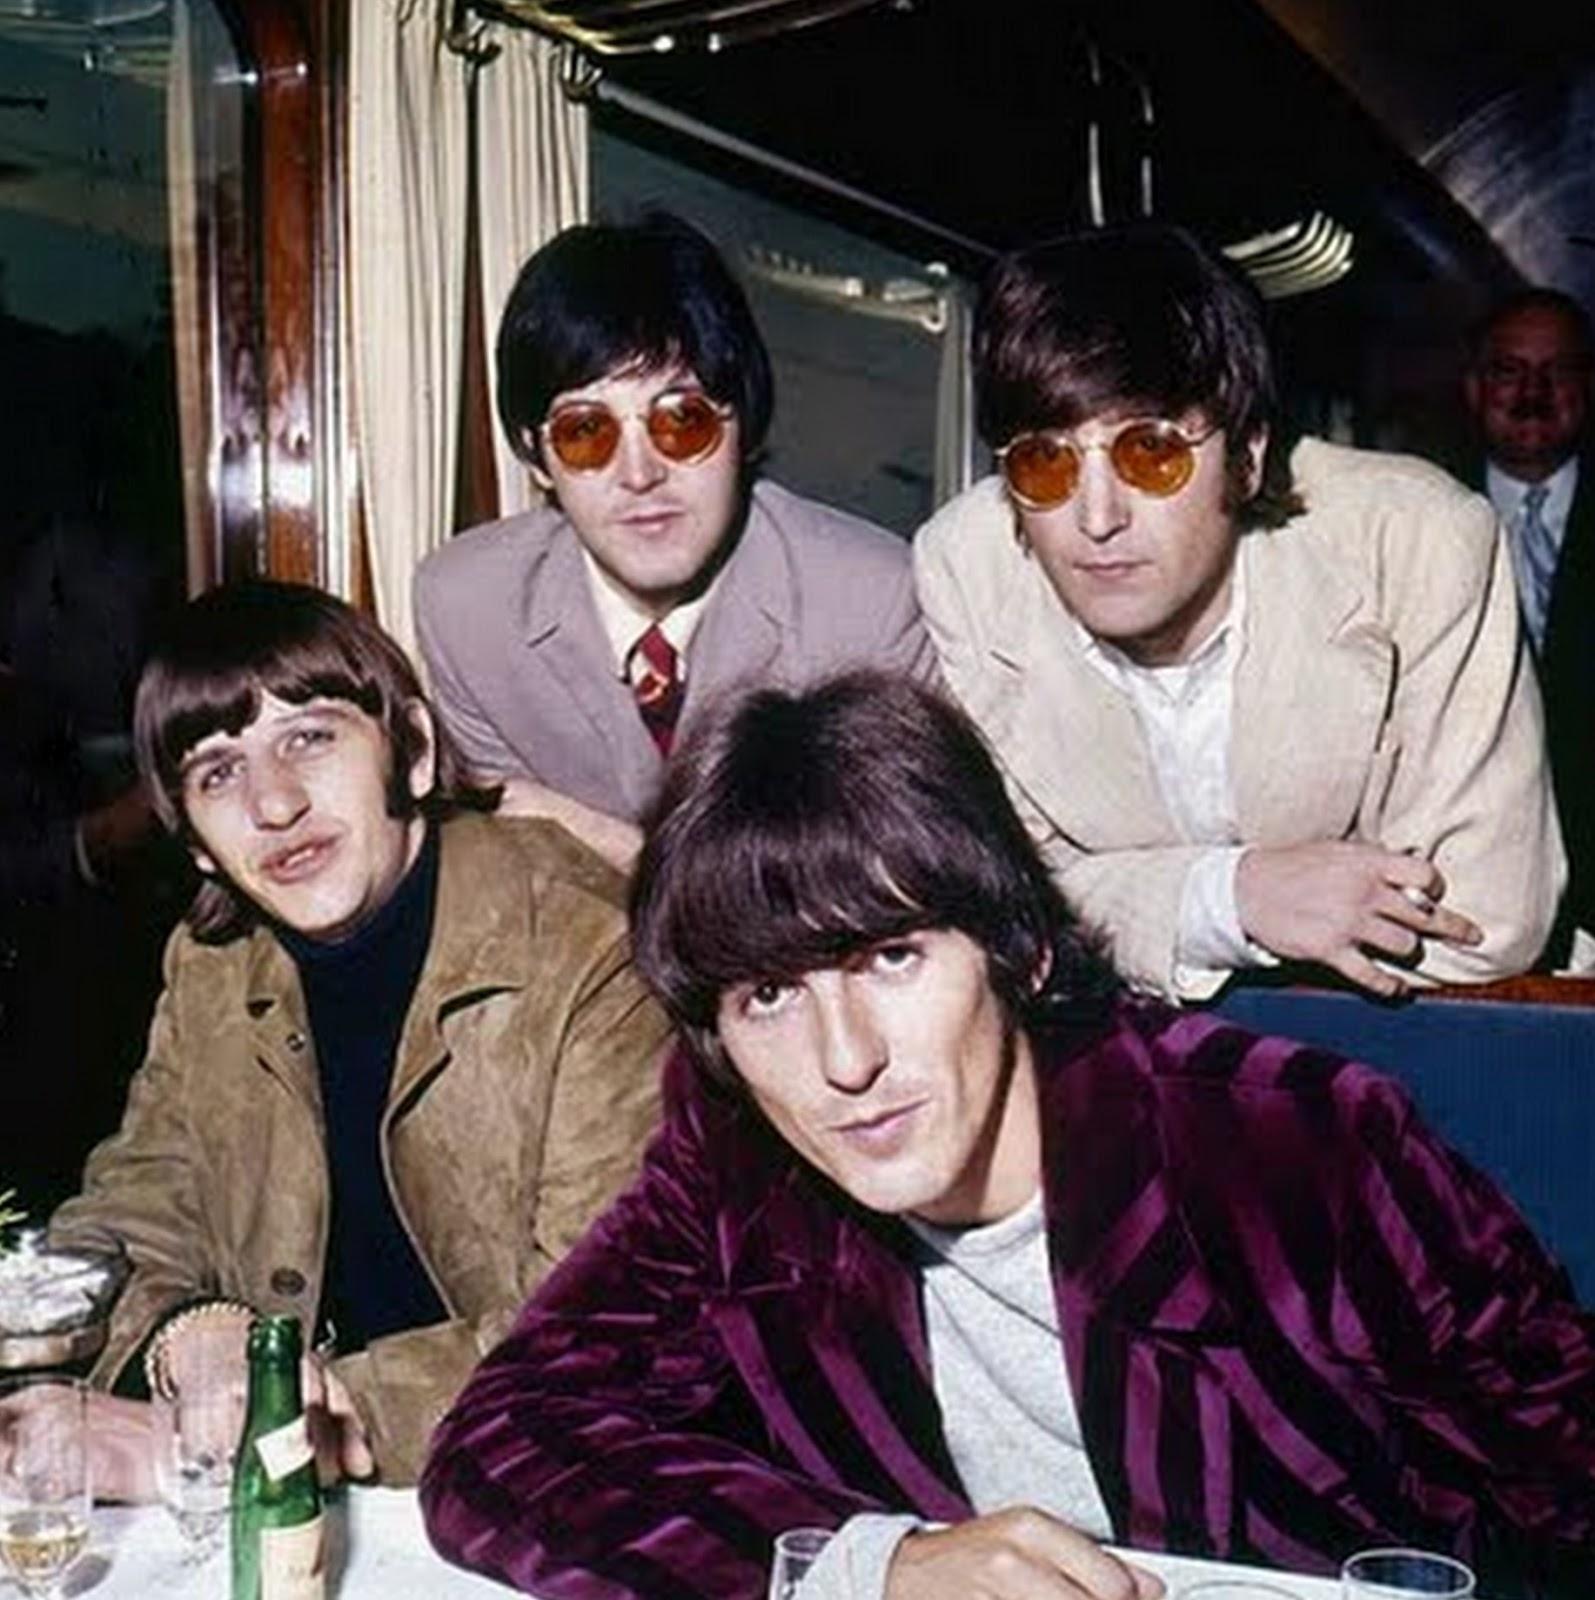 Bespectacled Birthdays Paul McCartney C1966